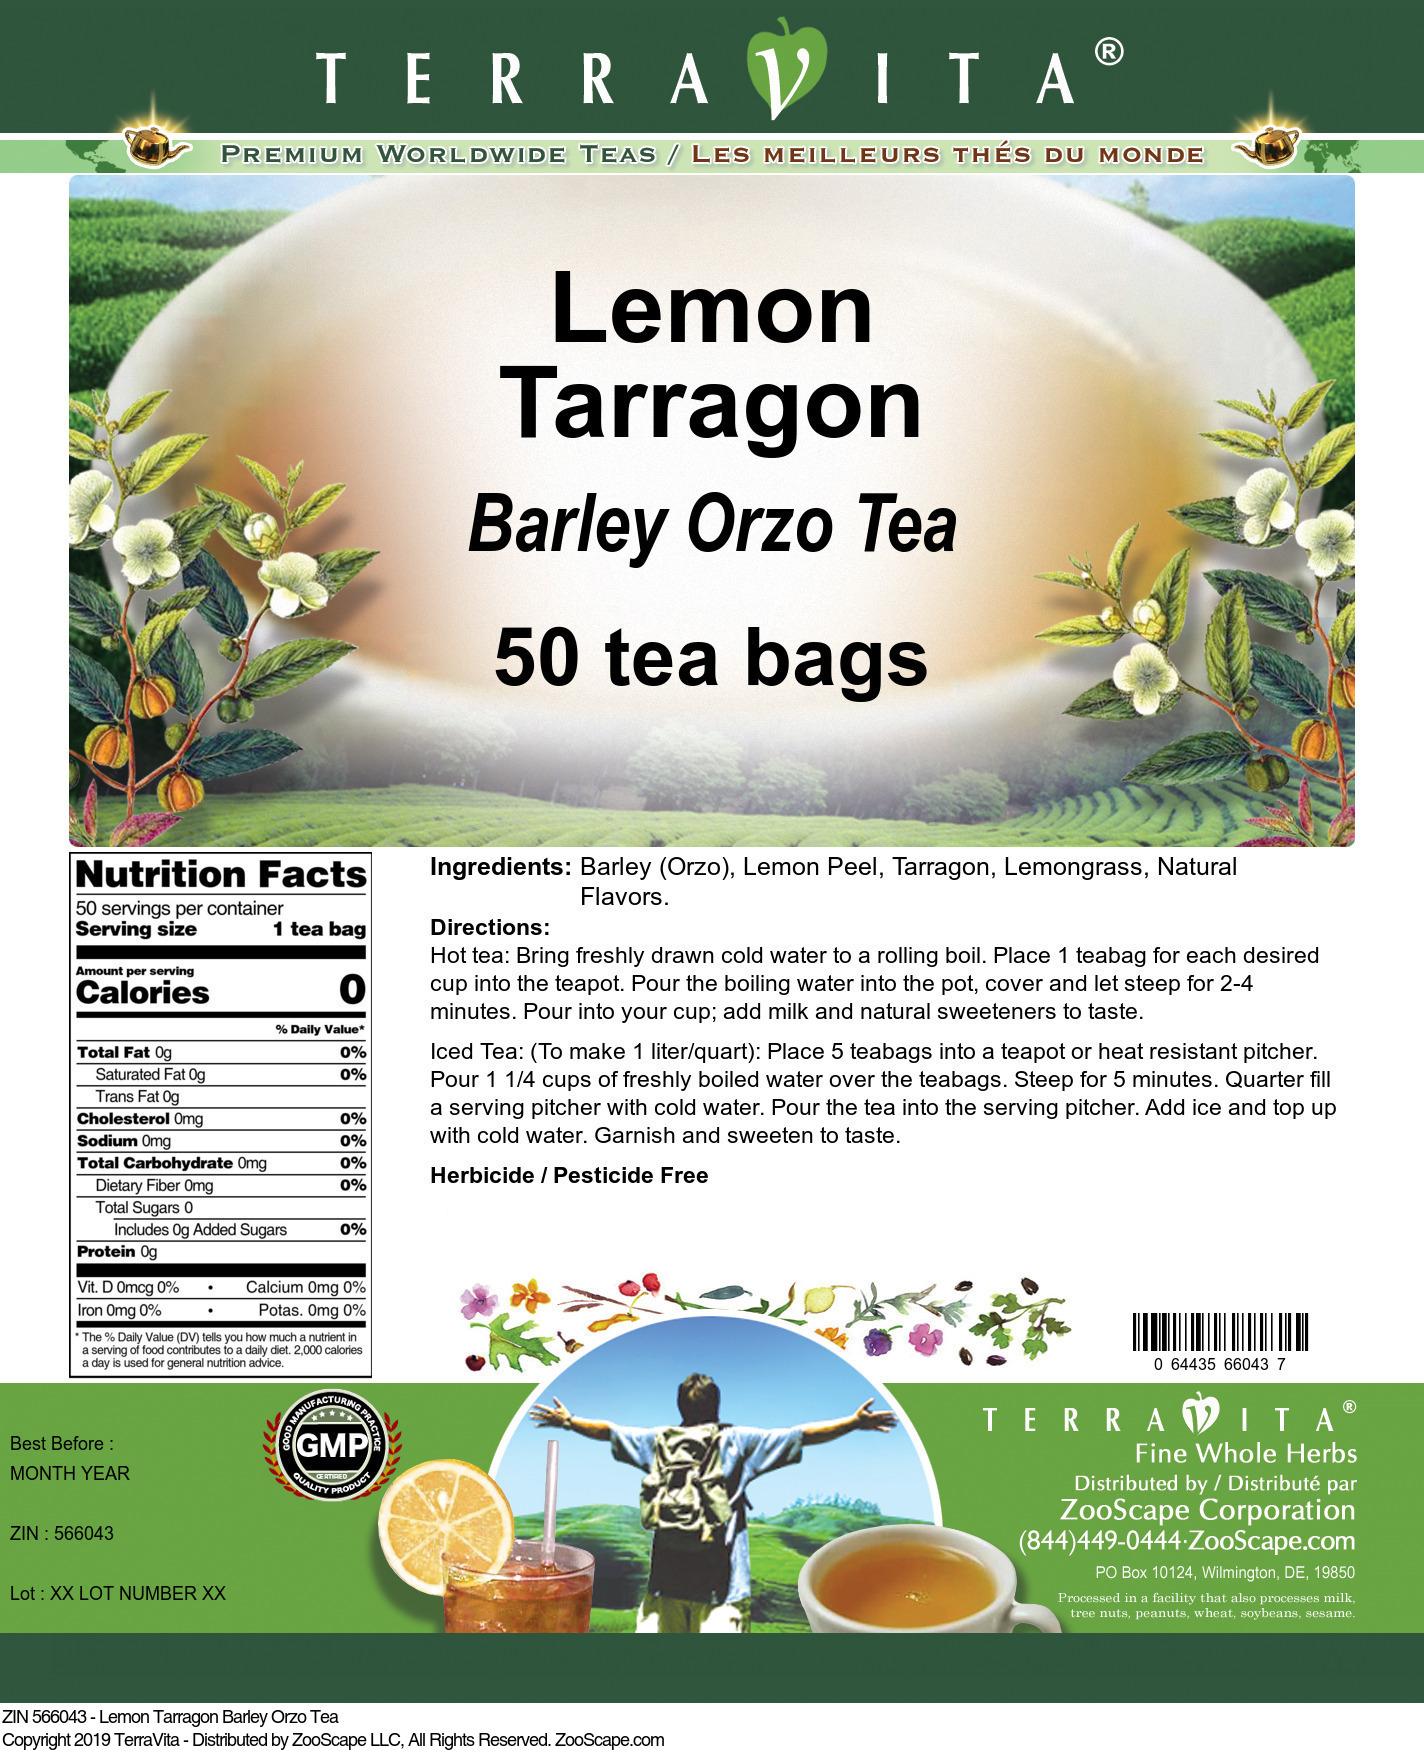 Lemon Tarragon Barley Orzo